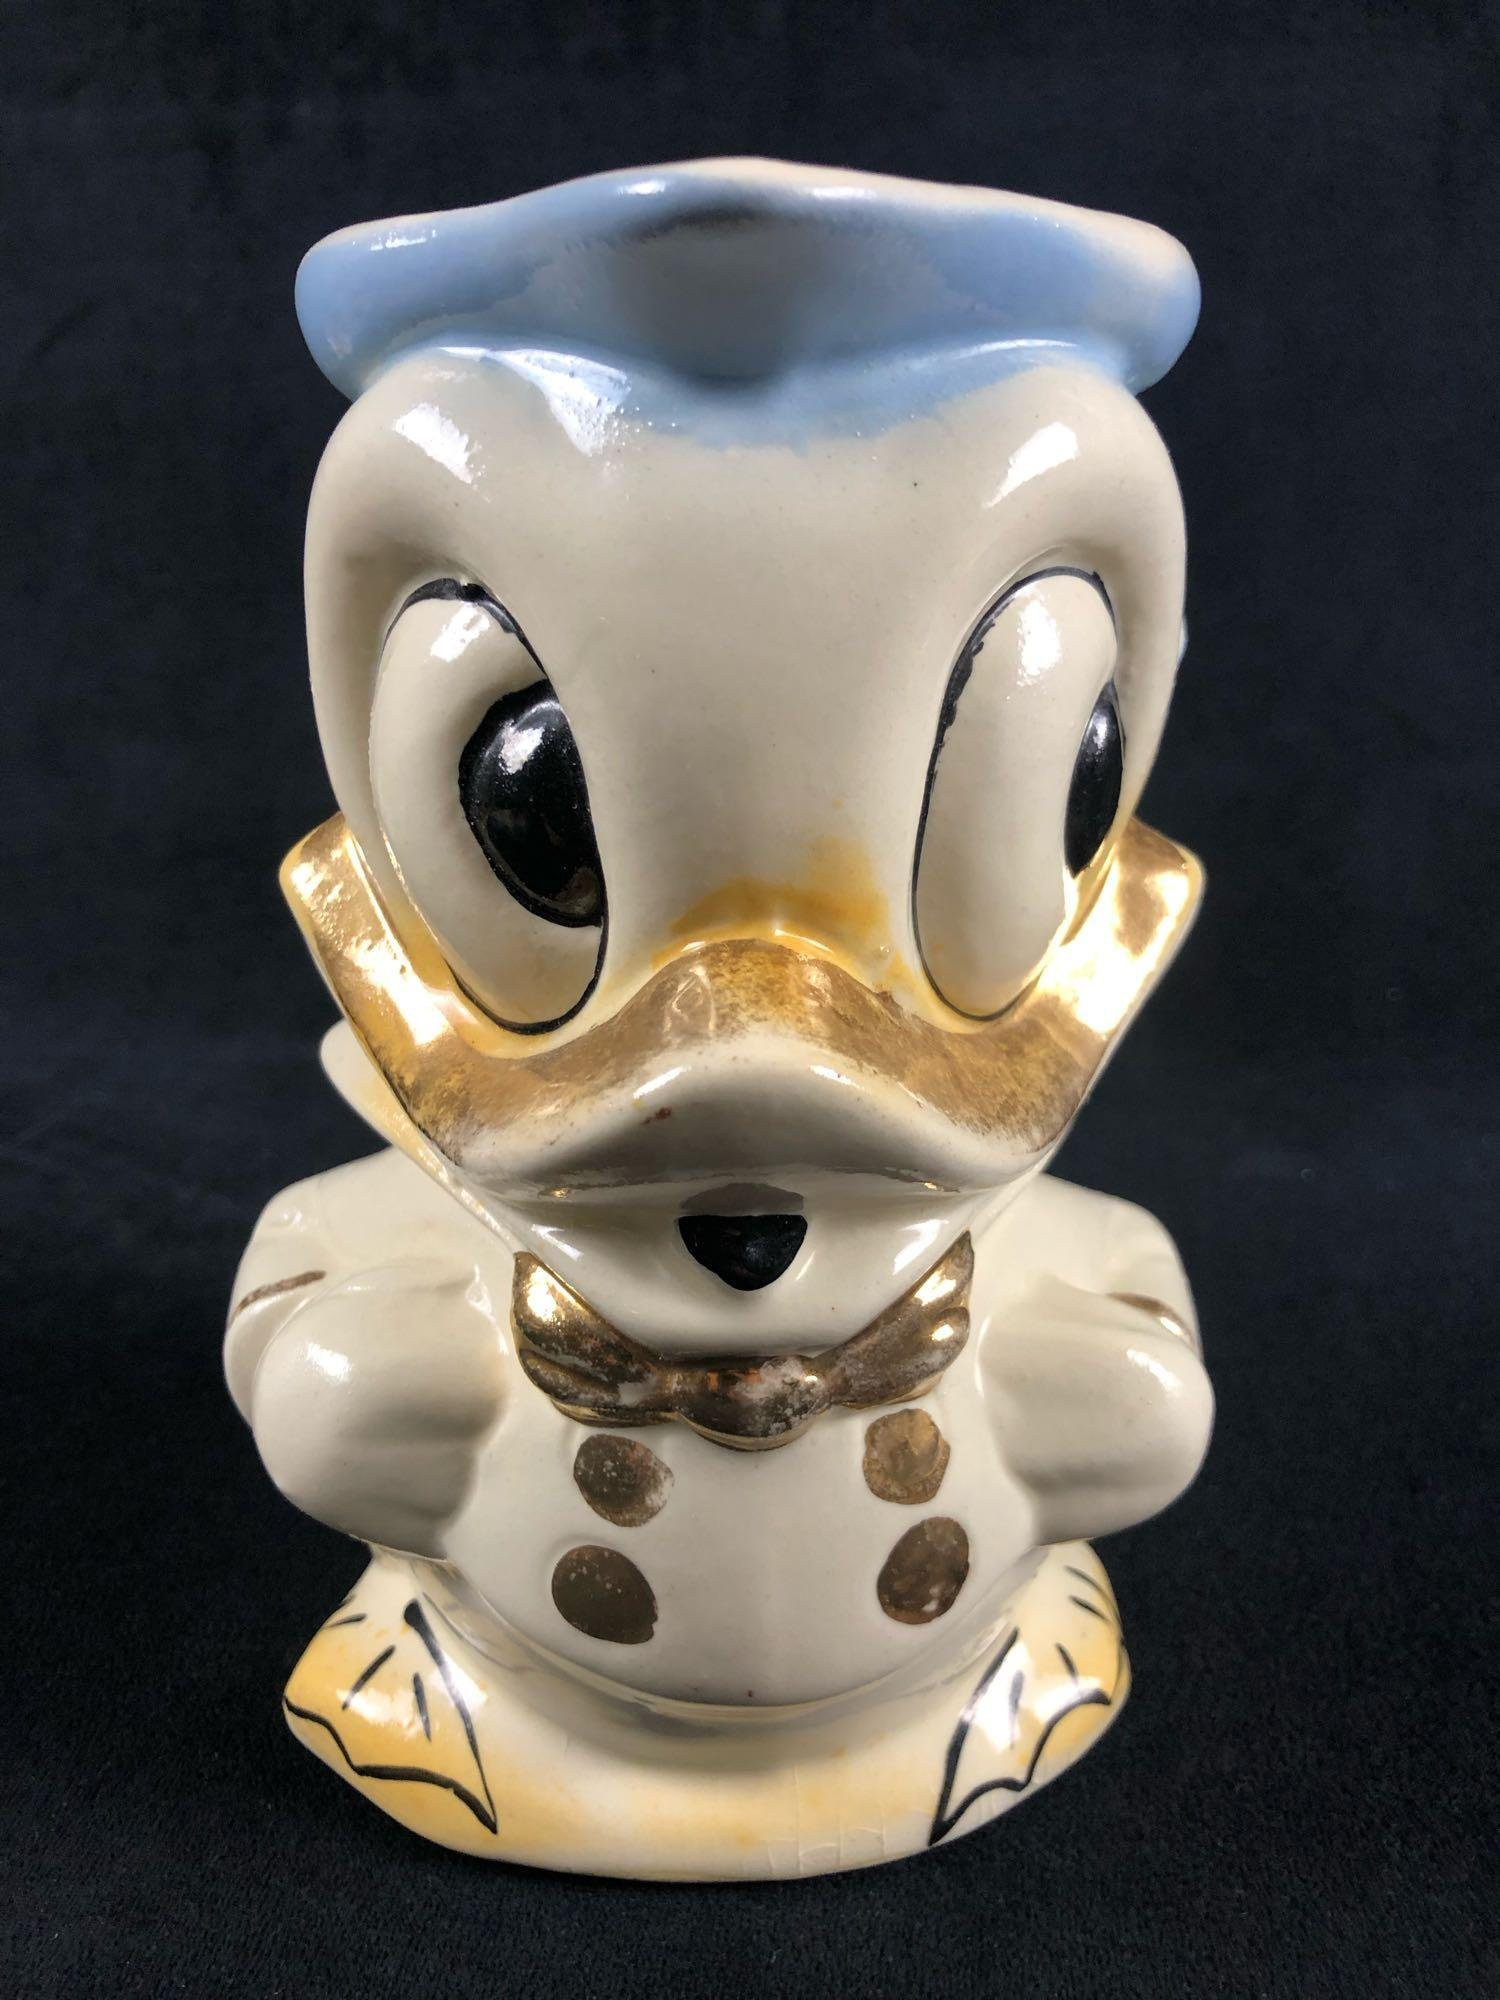 Vintage Donald Duck Ceramic Jug Pitcher Creamer Mid